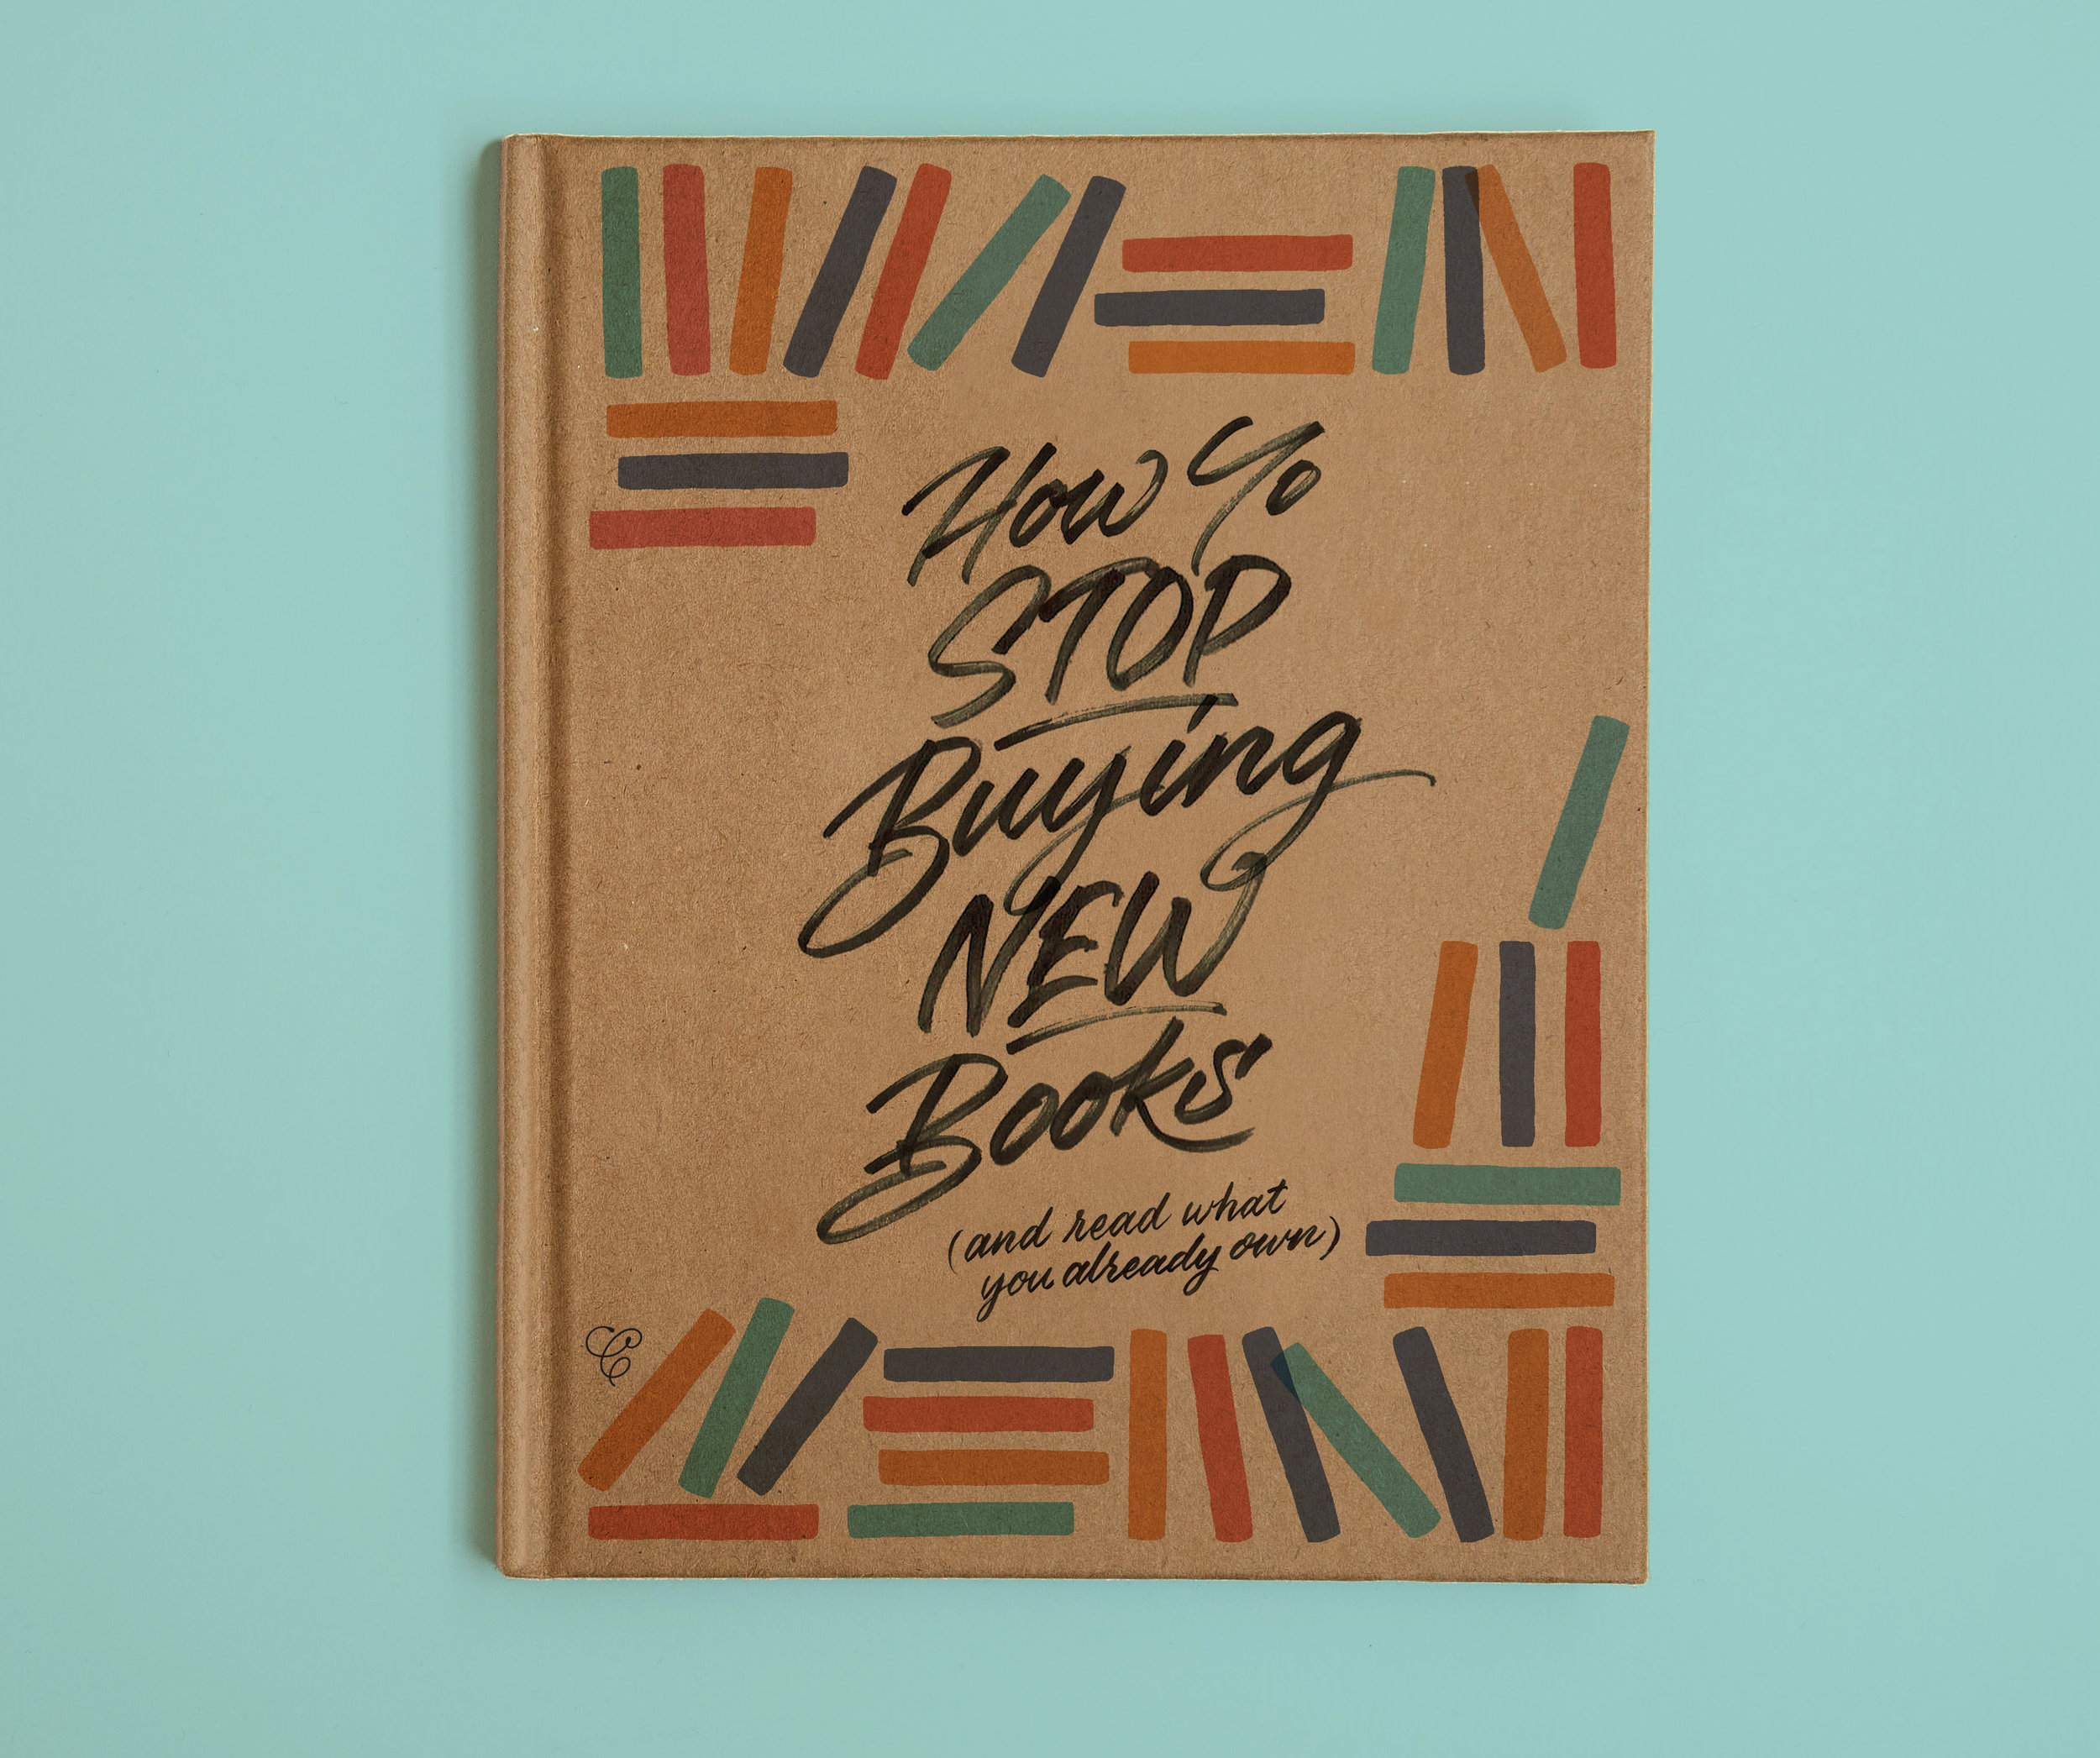 buyingbooks_tumblr.jpg